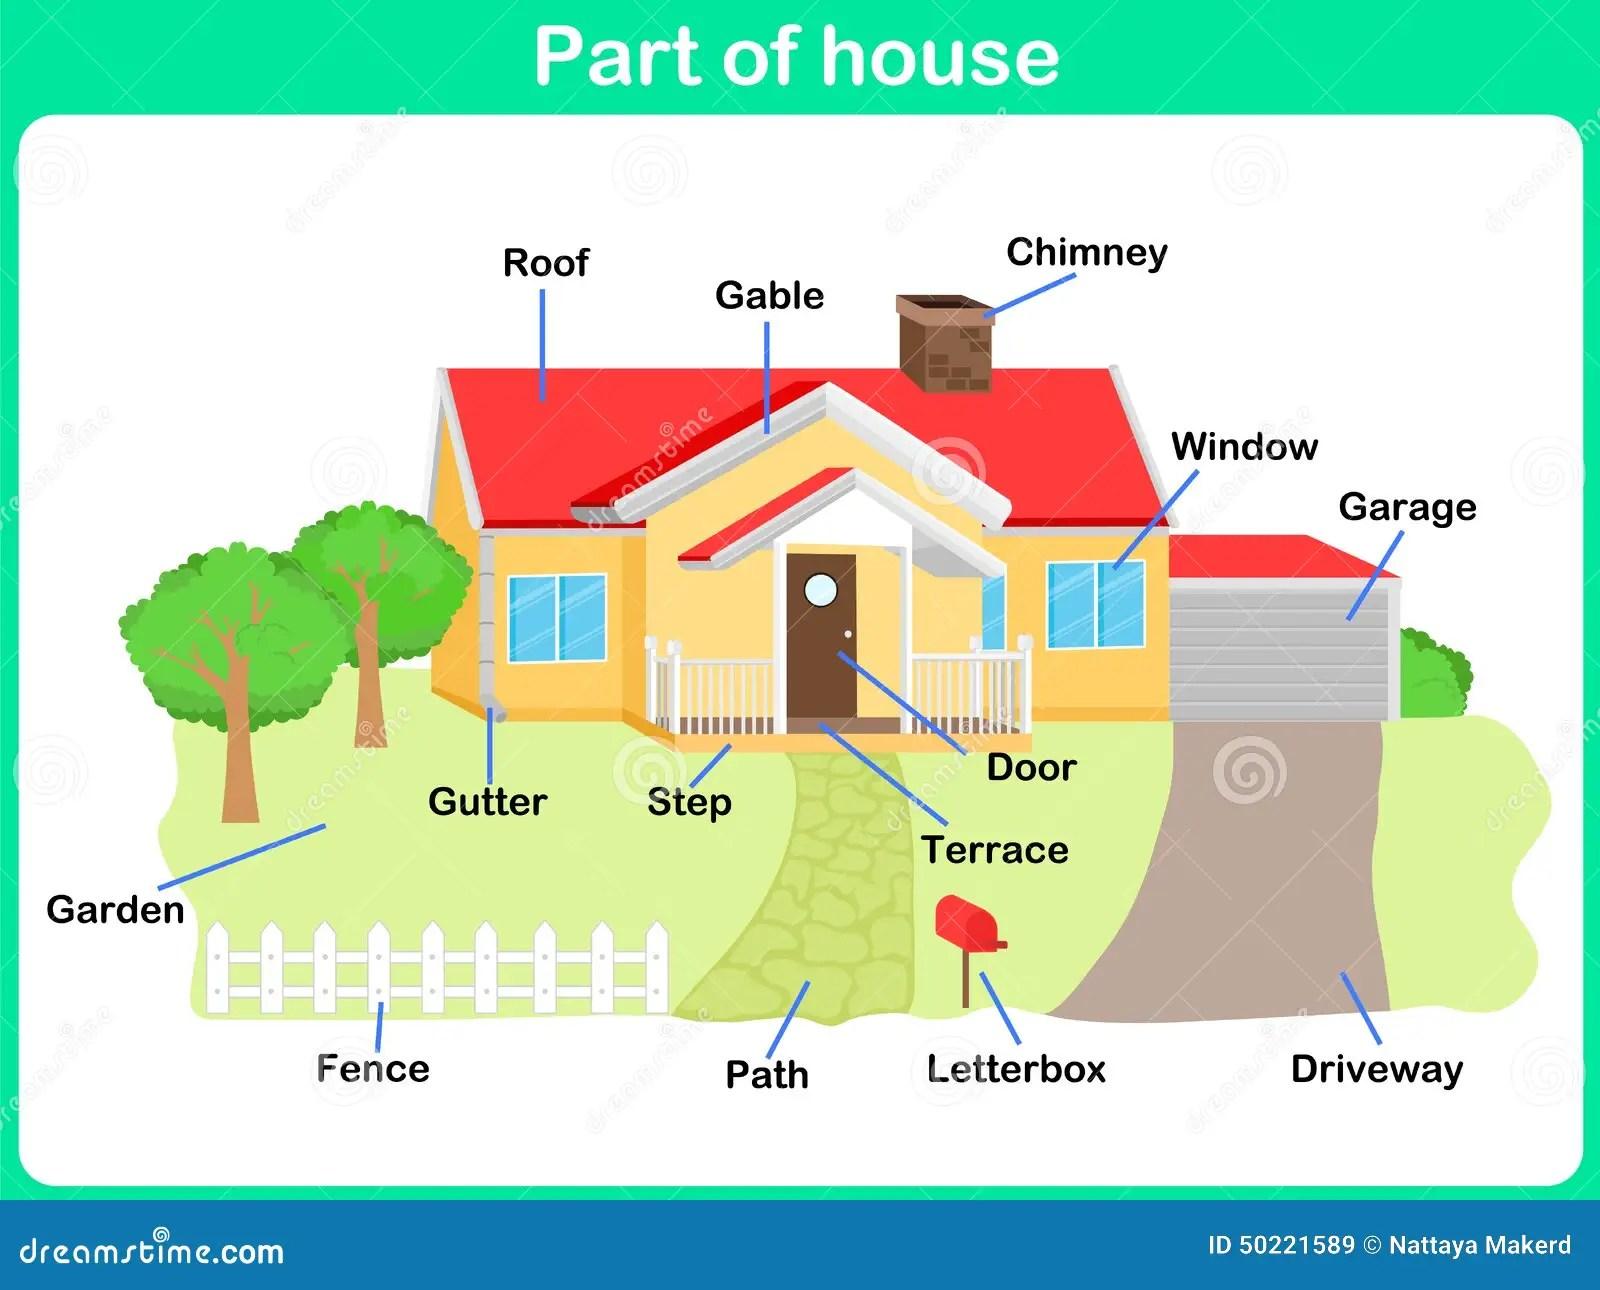 House Inglesparaminis